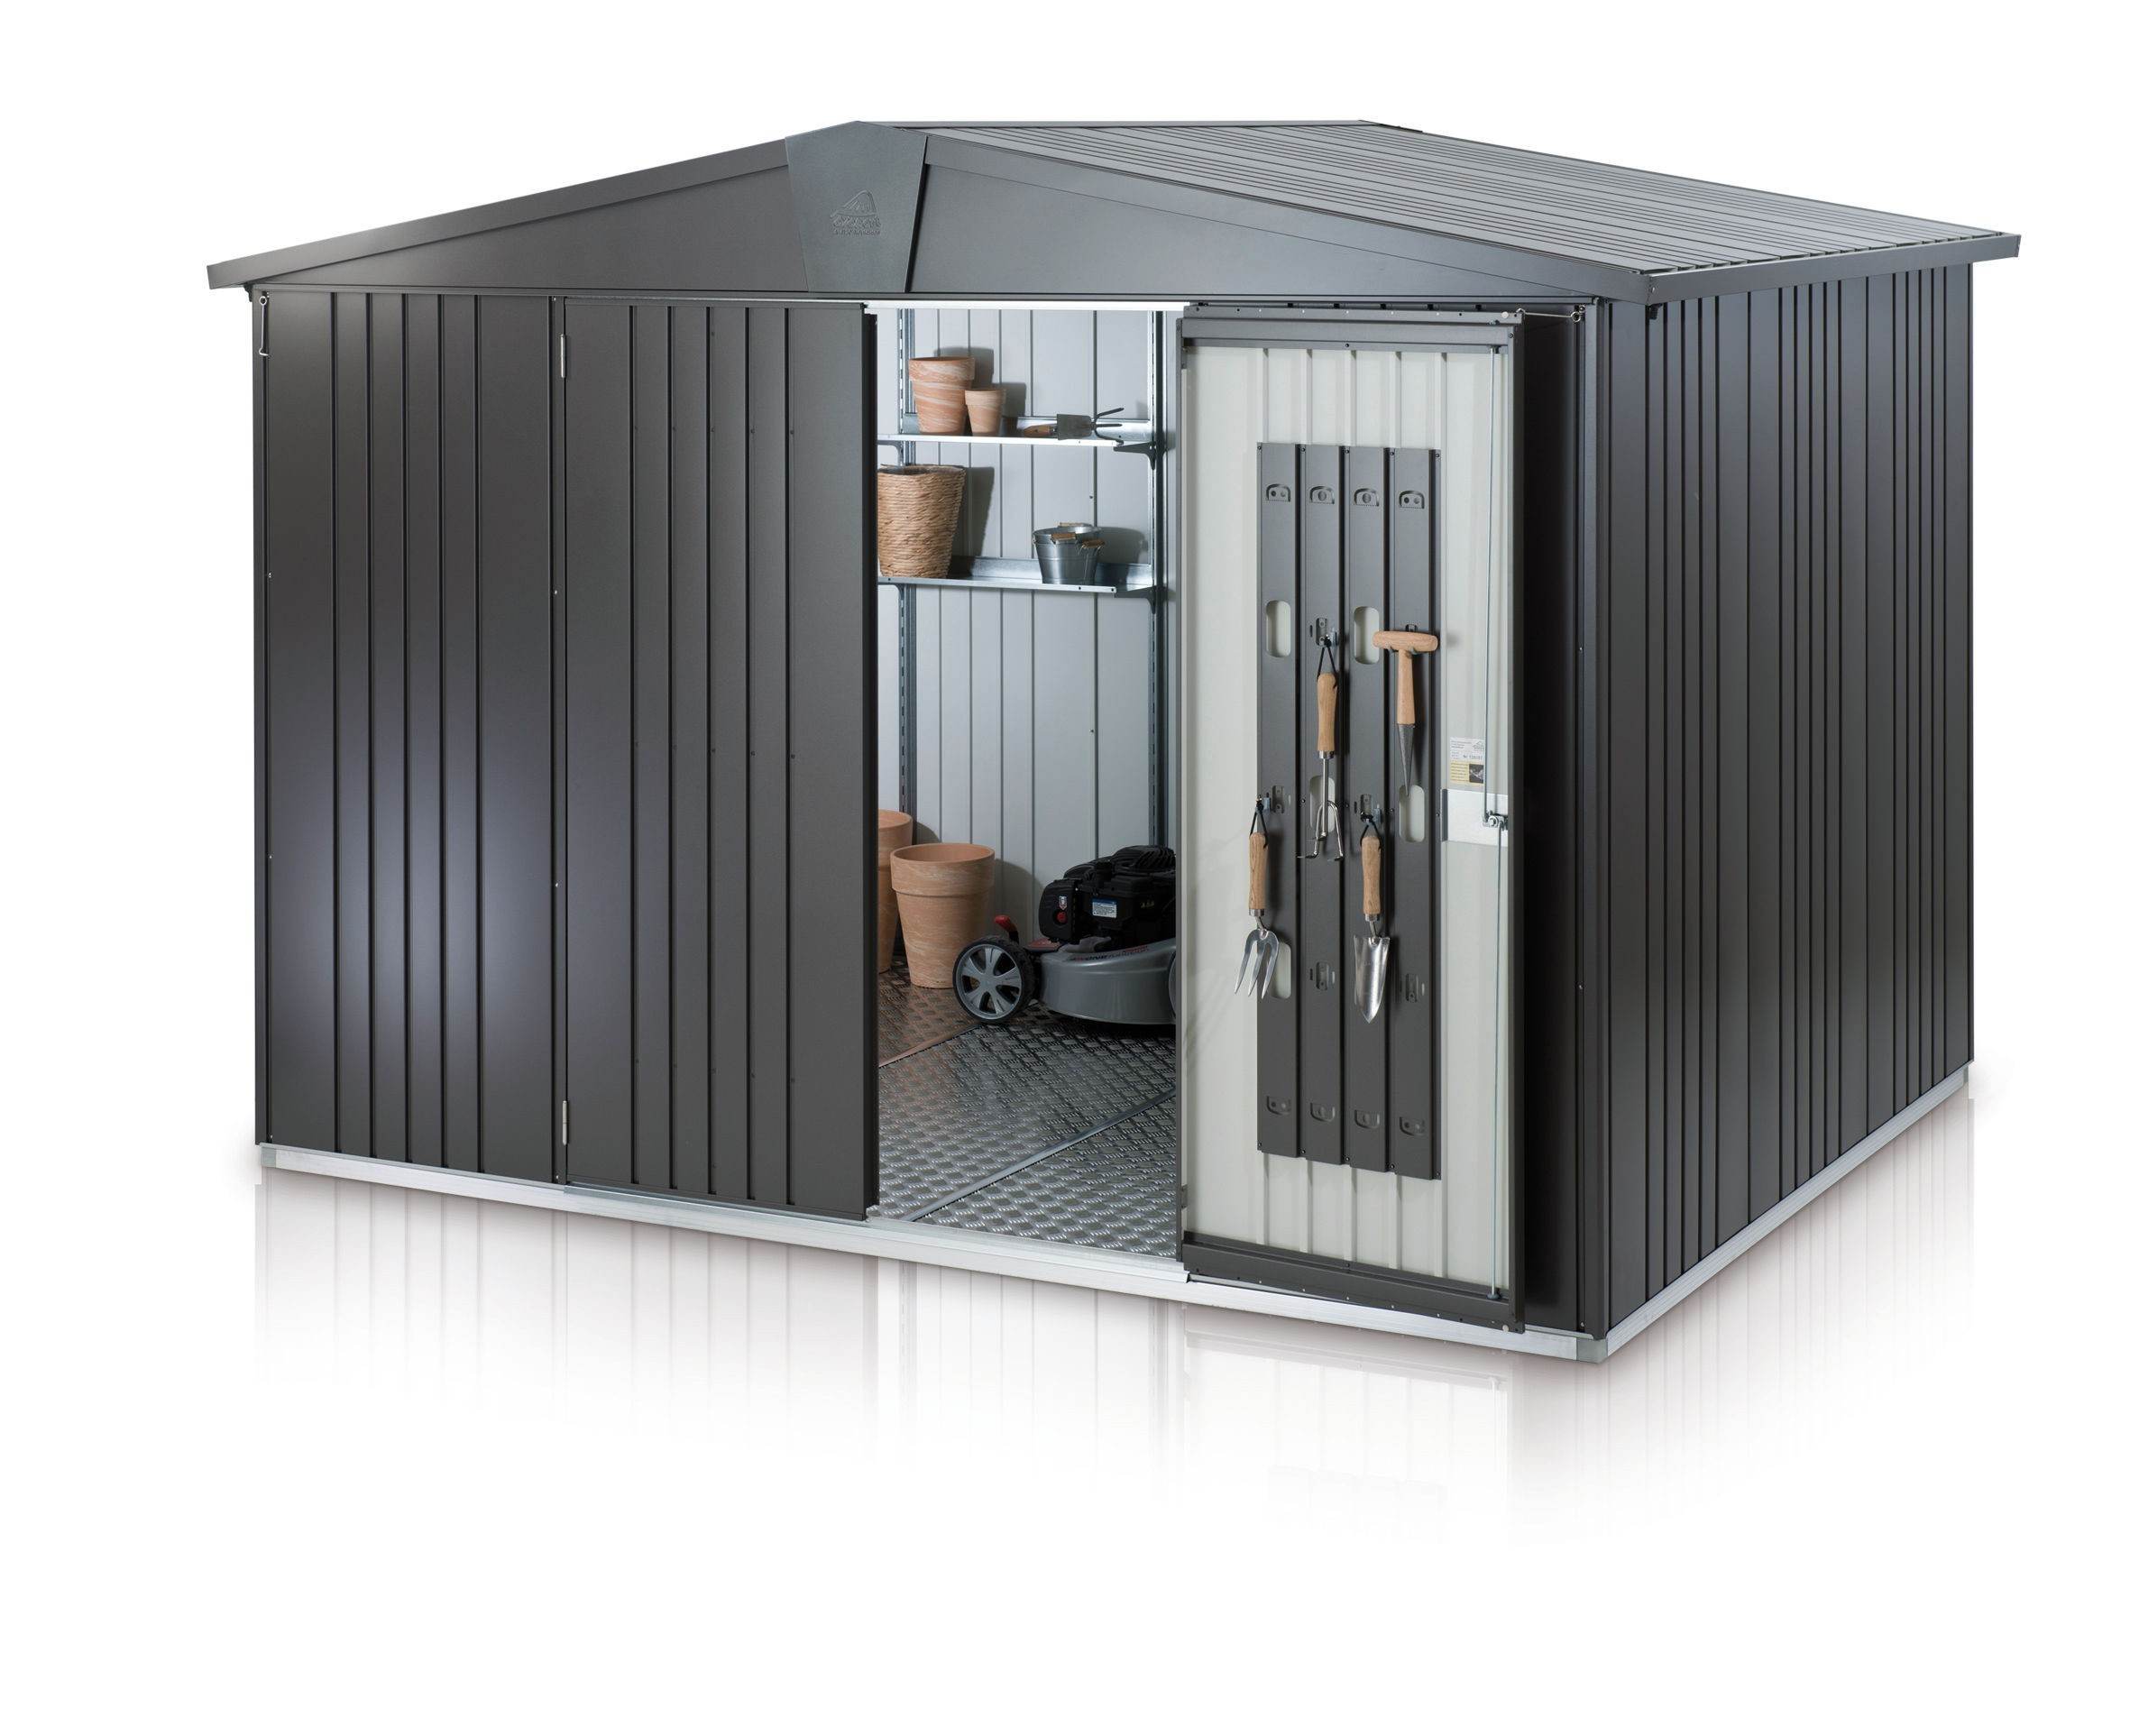 ger tehaus biohort europa gr 5 dunkelgrau metallic 316x228x209 bei. Black Bedroom Furniture Sets. Home Design Ideas